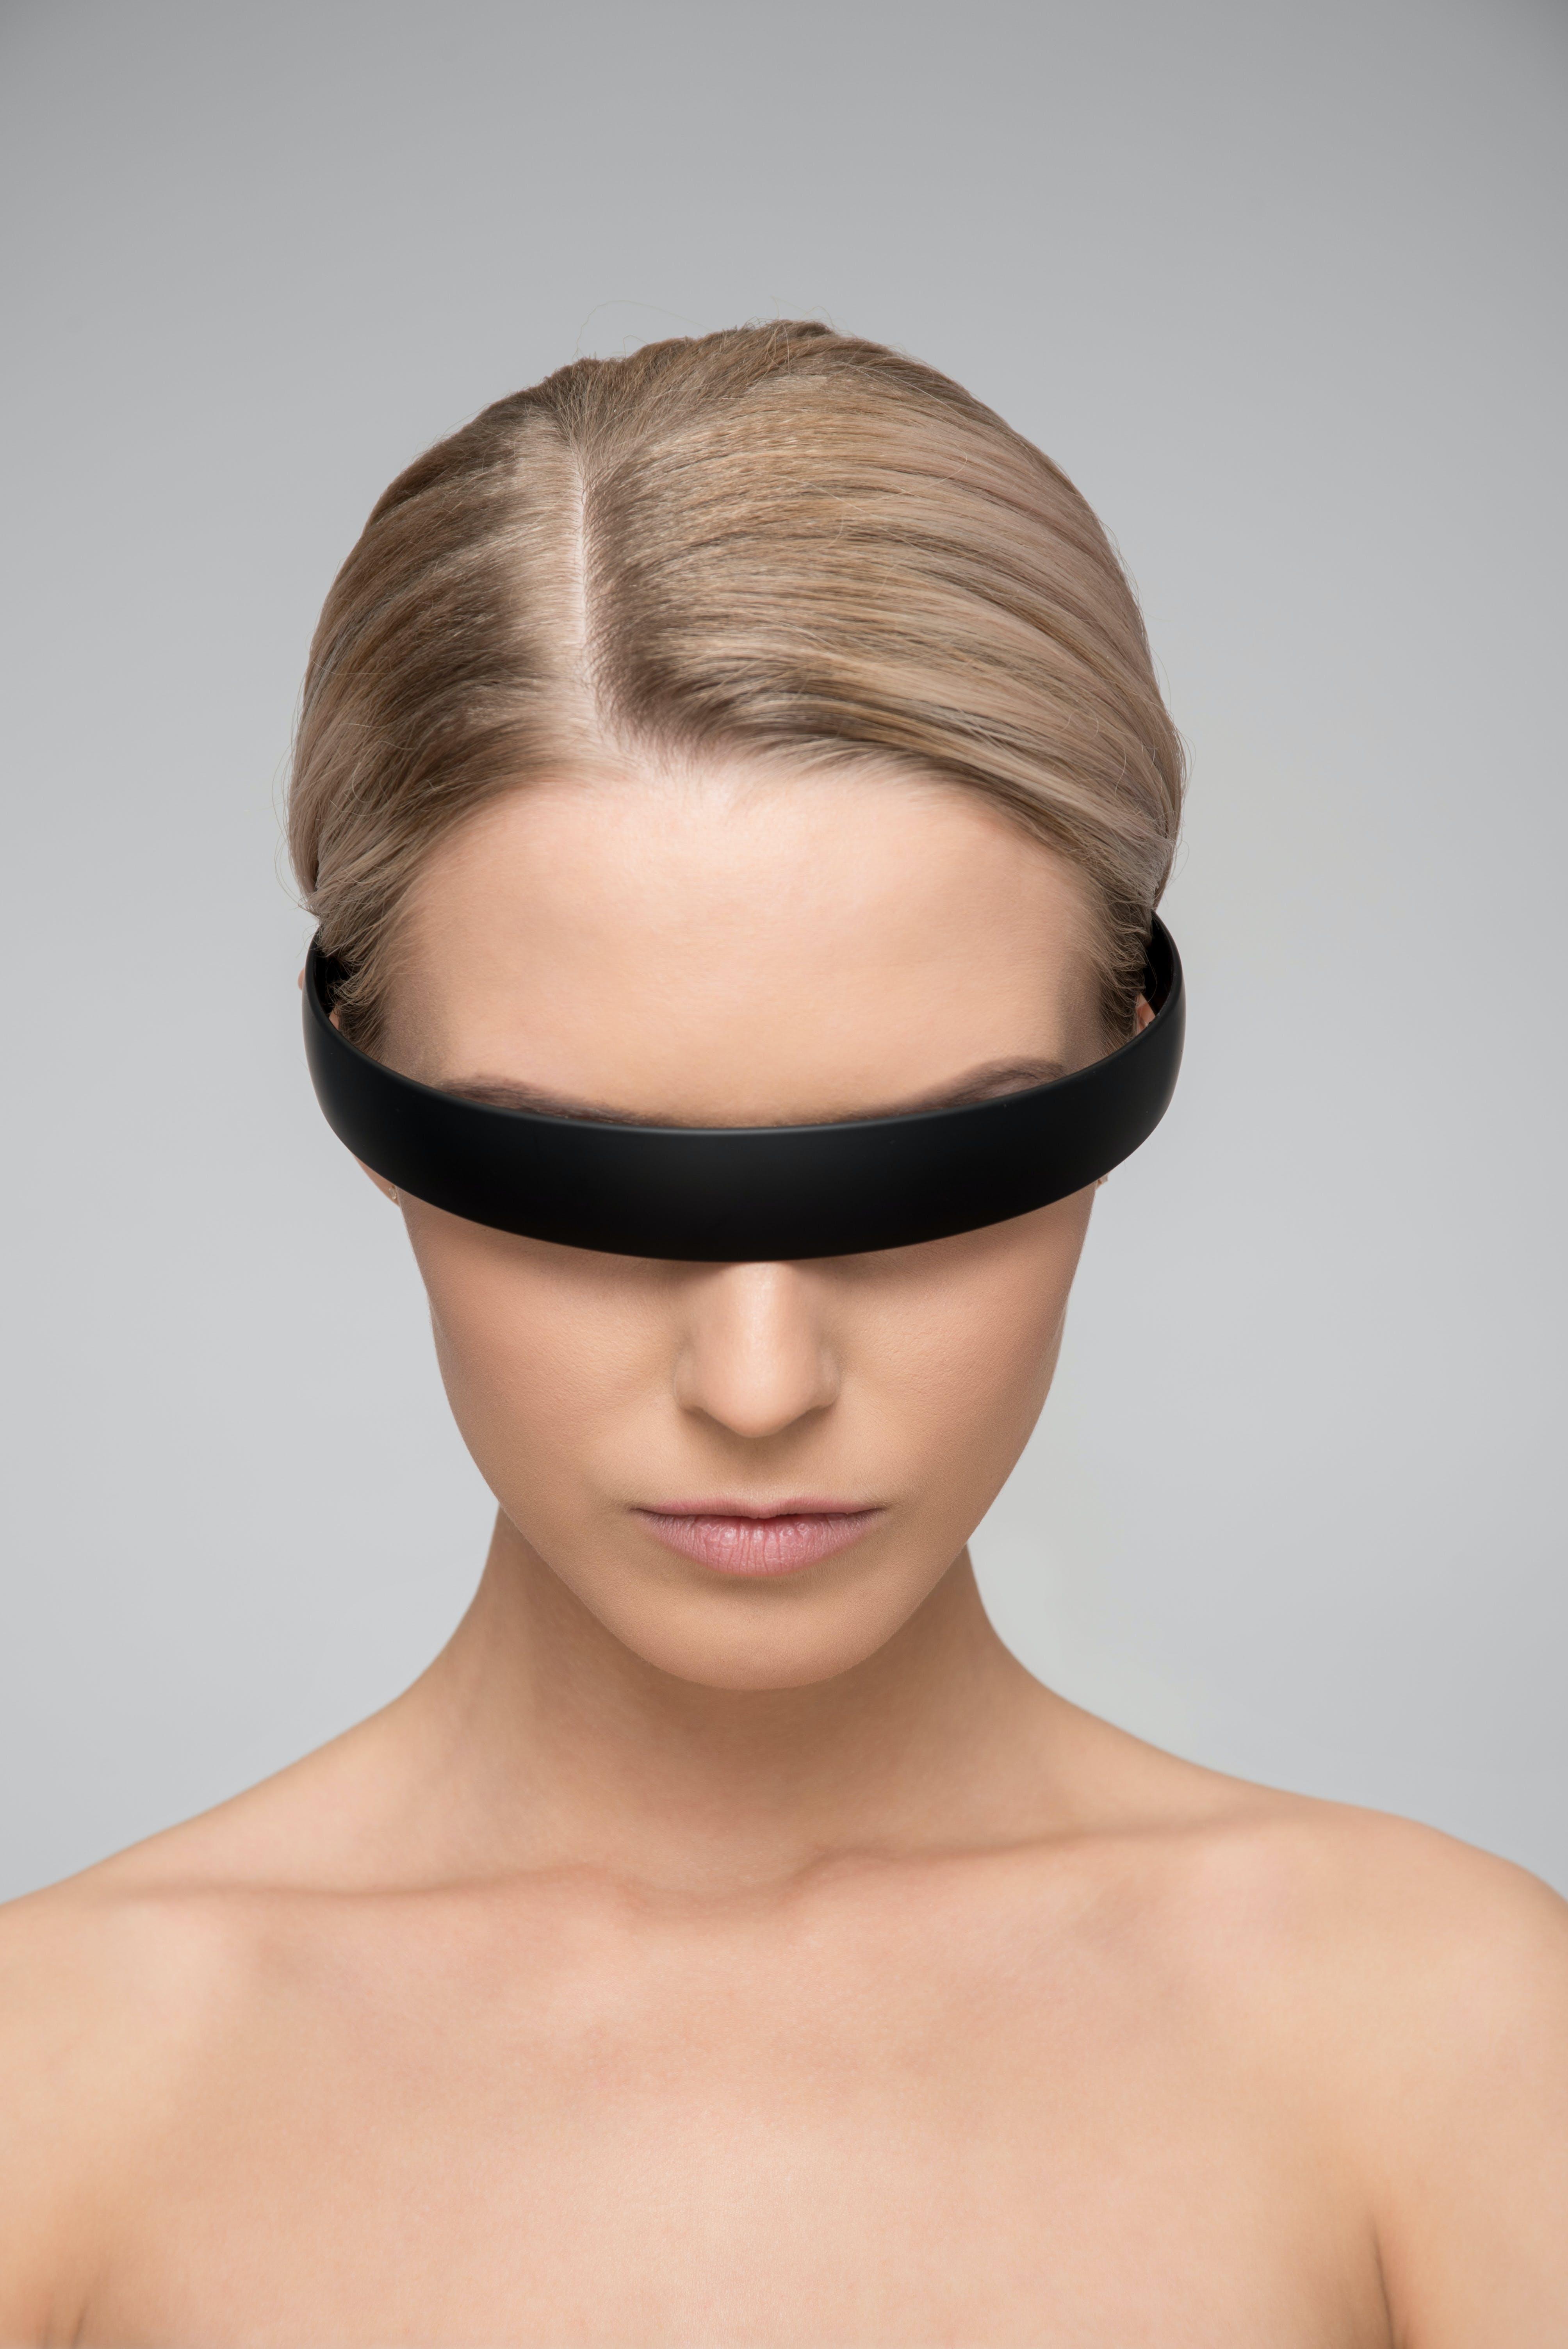 Topless Woman Wearing Black Headband